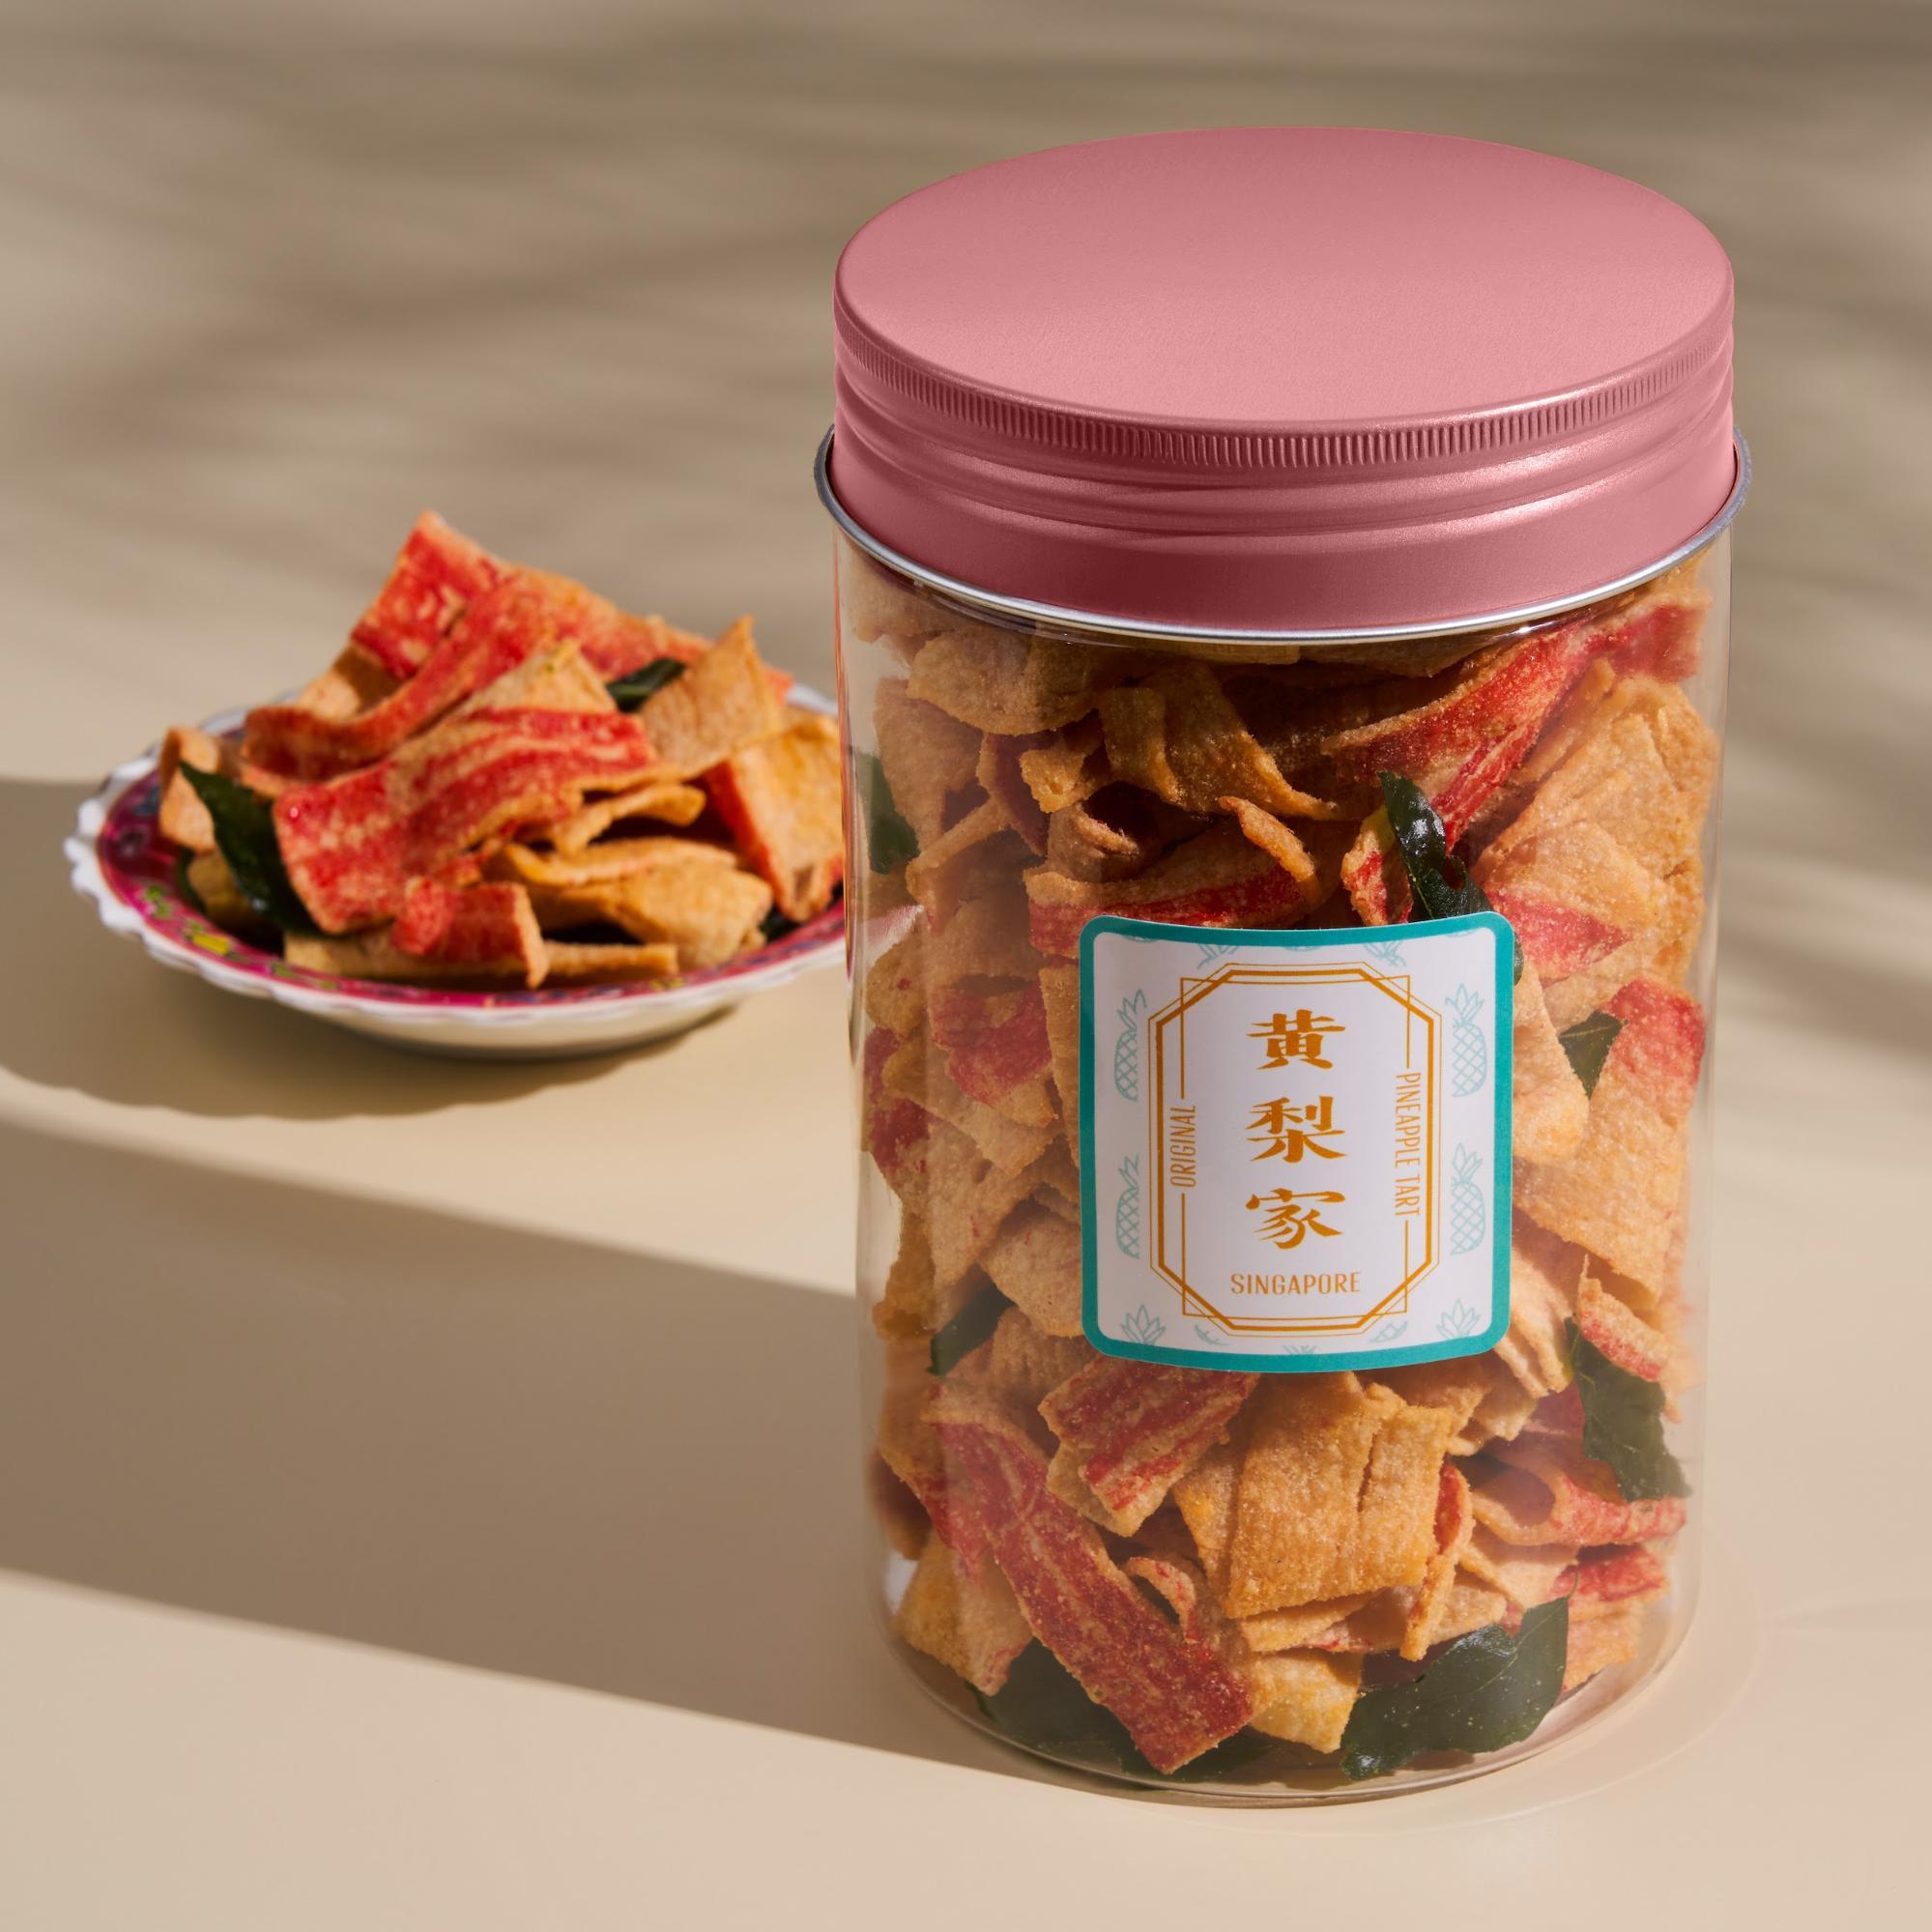 CNY snacks - crab stick crackers